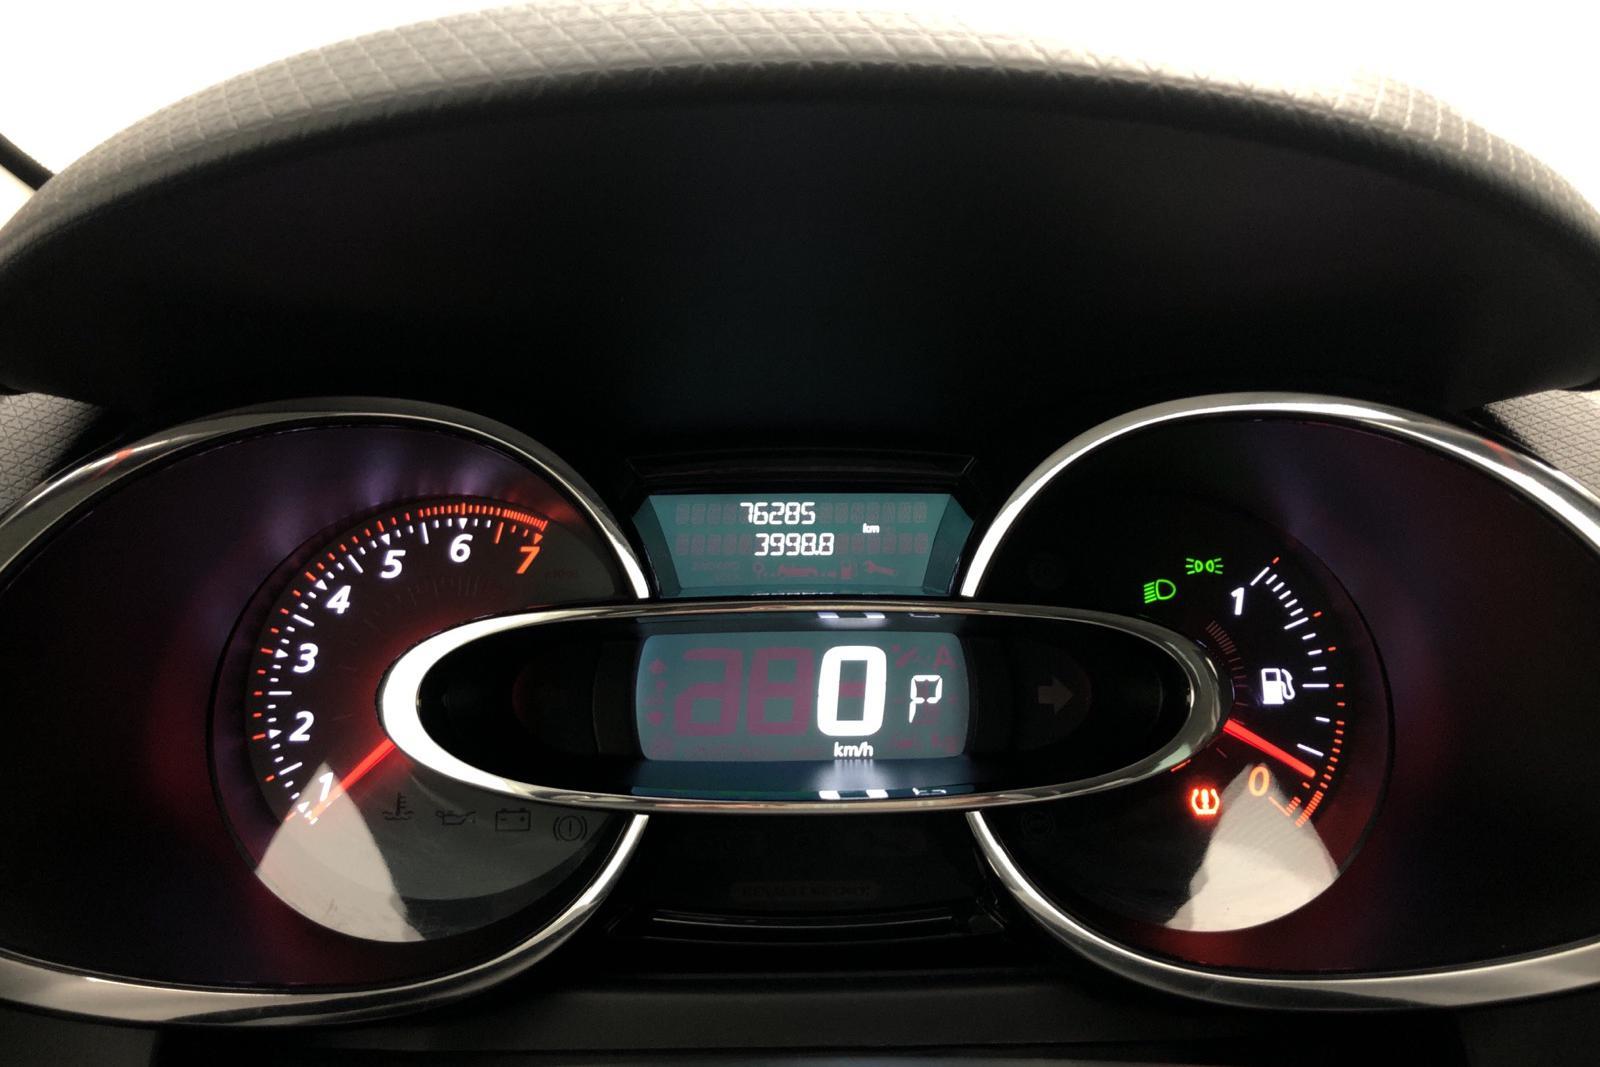 Renault Clio IV R.S. 200 (200hk) - 7 800 mil - svart - 2015